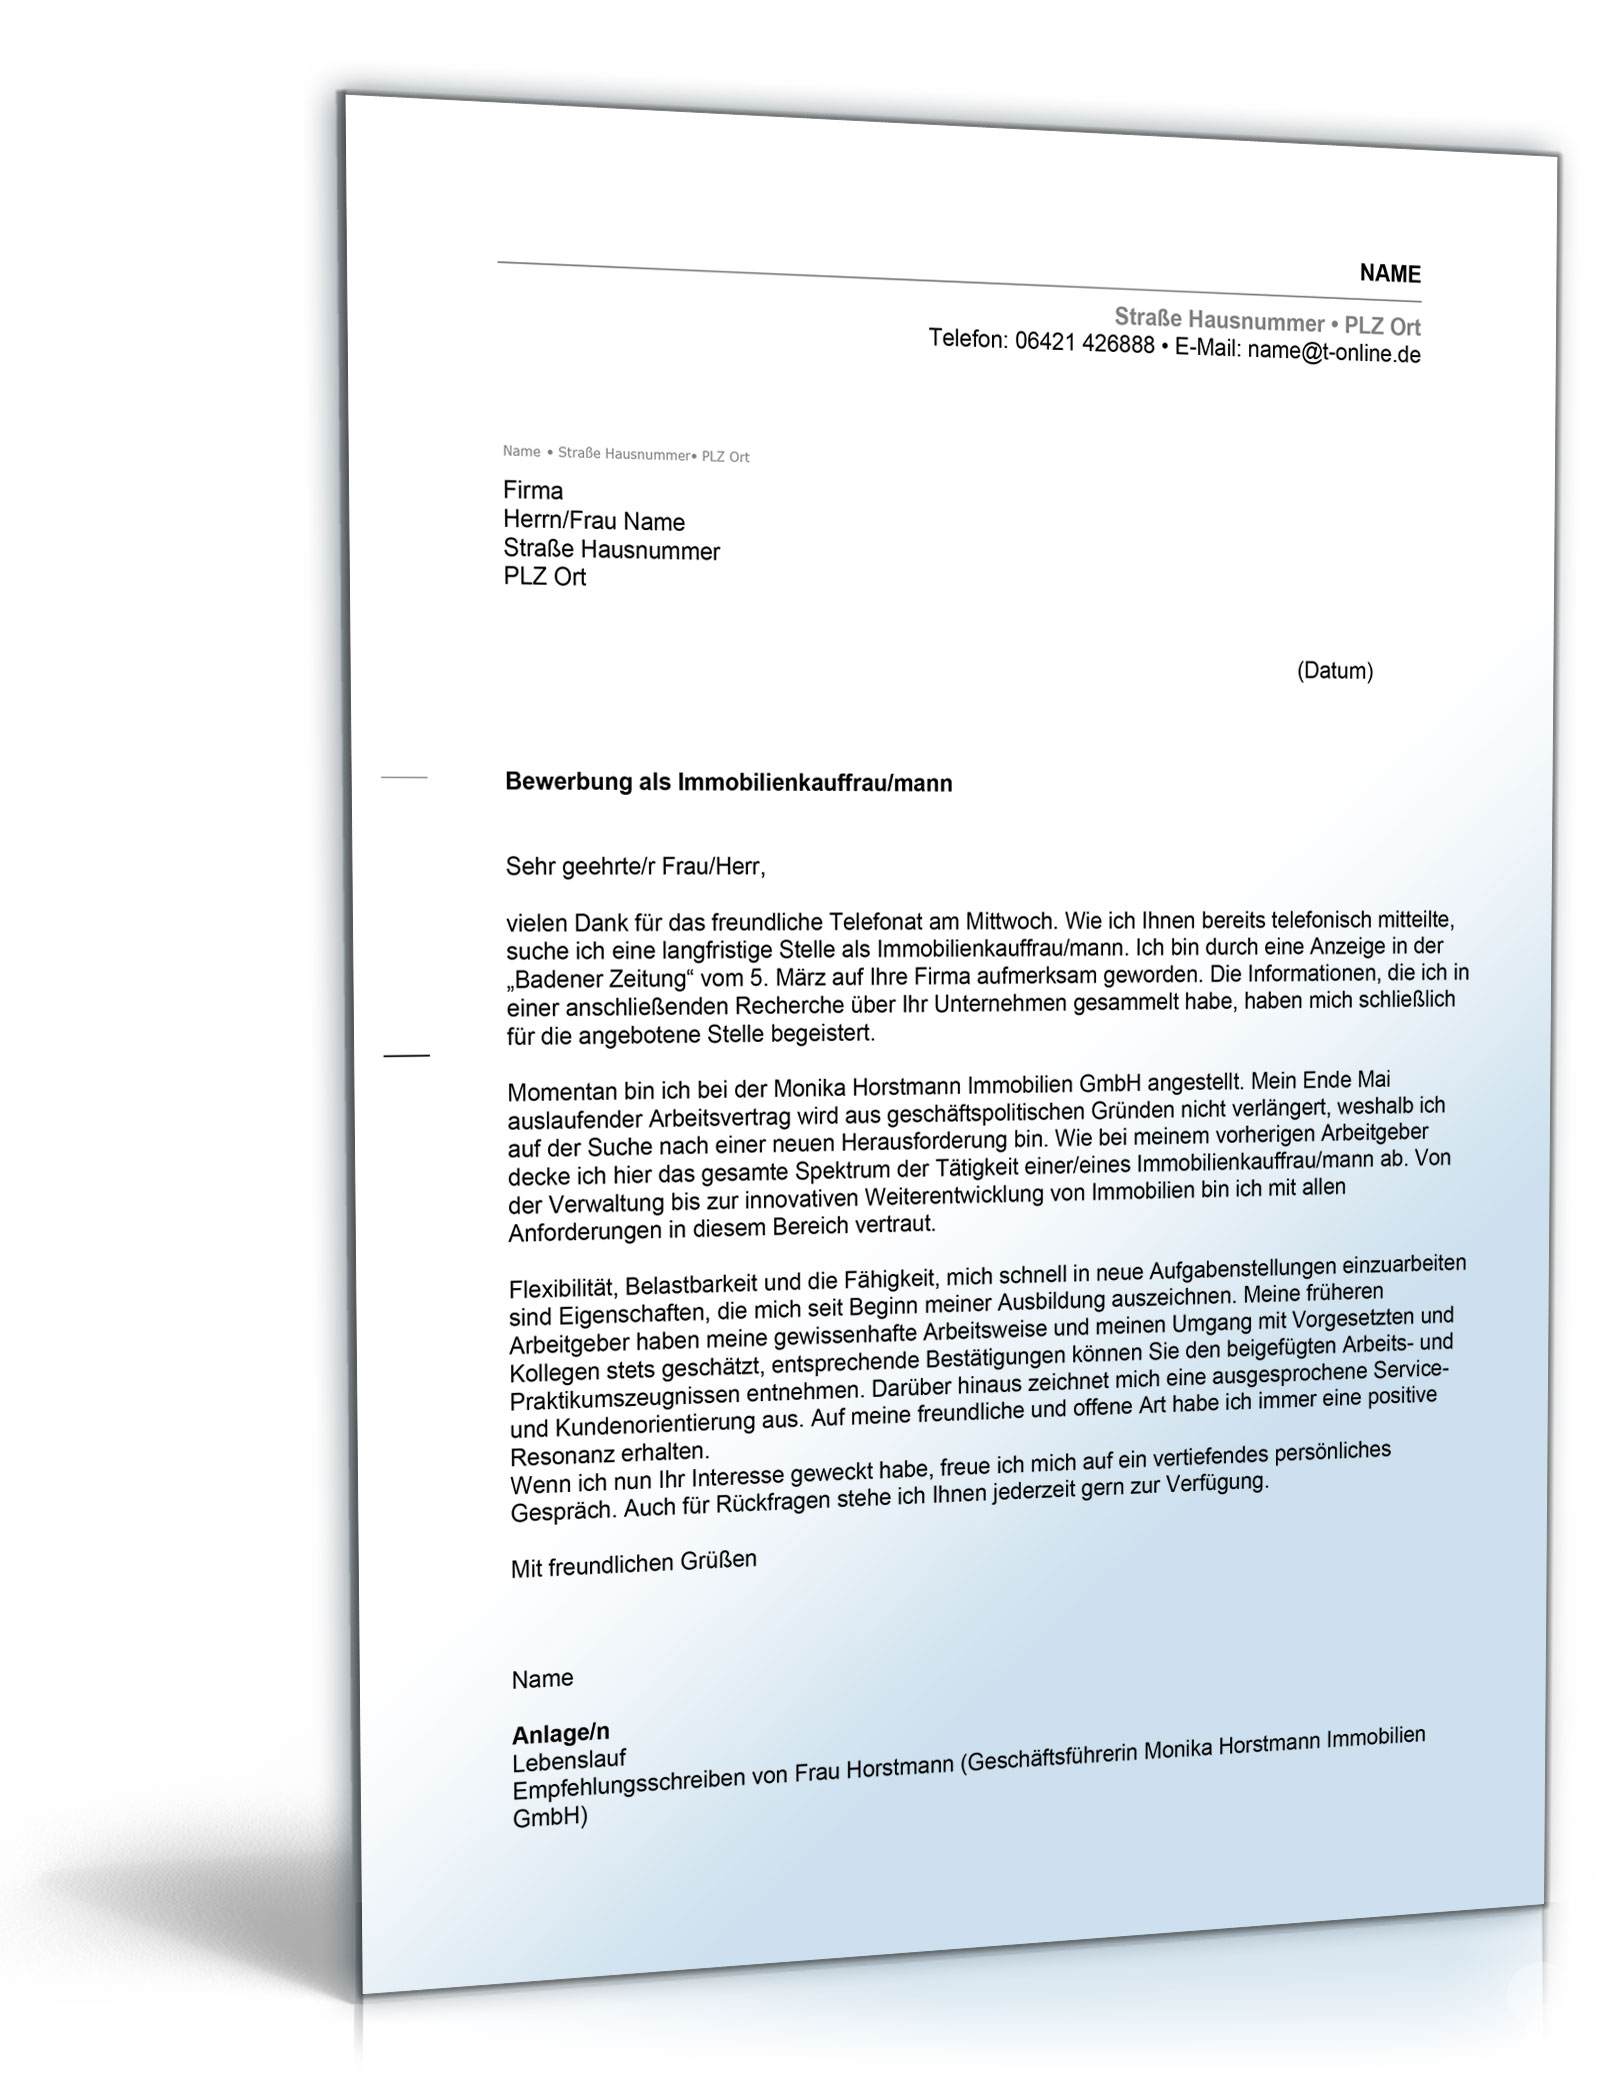 Anschreiben Bewerbung Immobilienkauffrau | ernisverfenwand